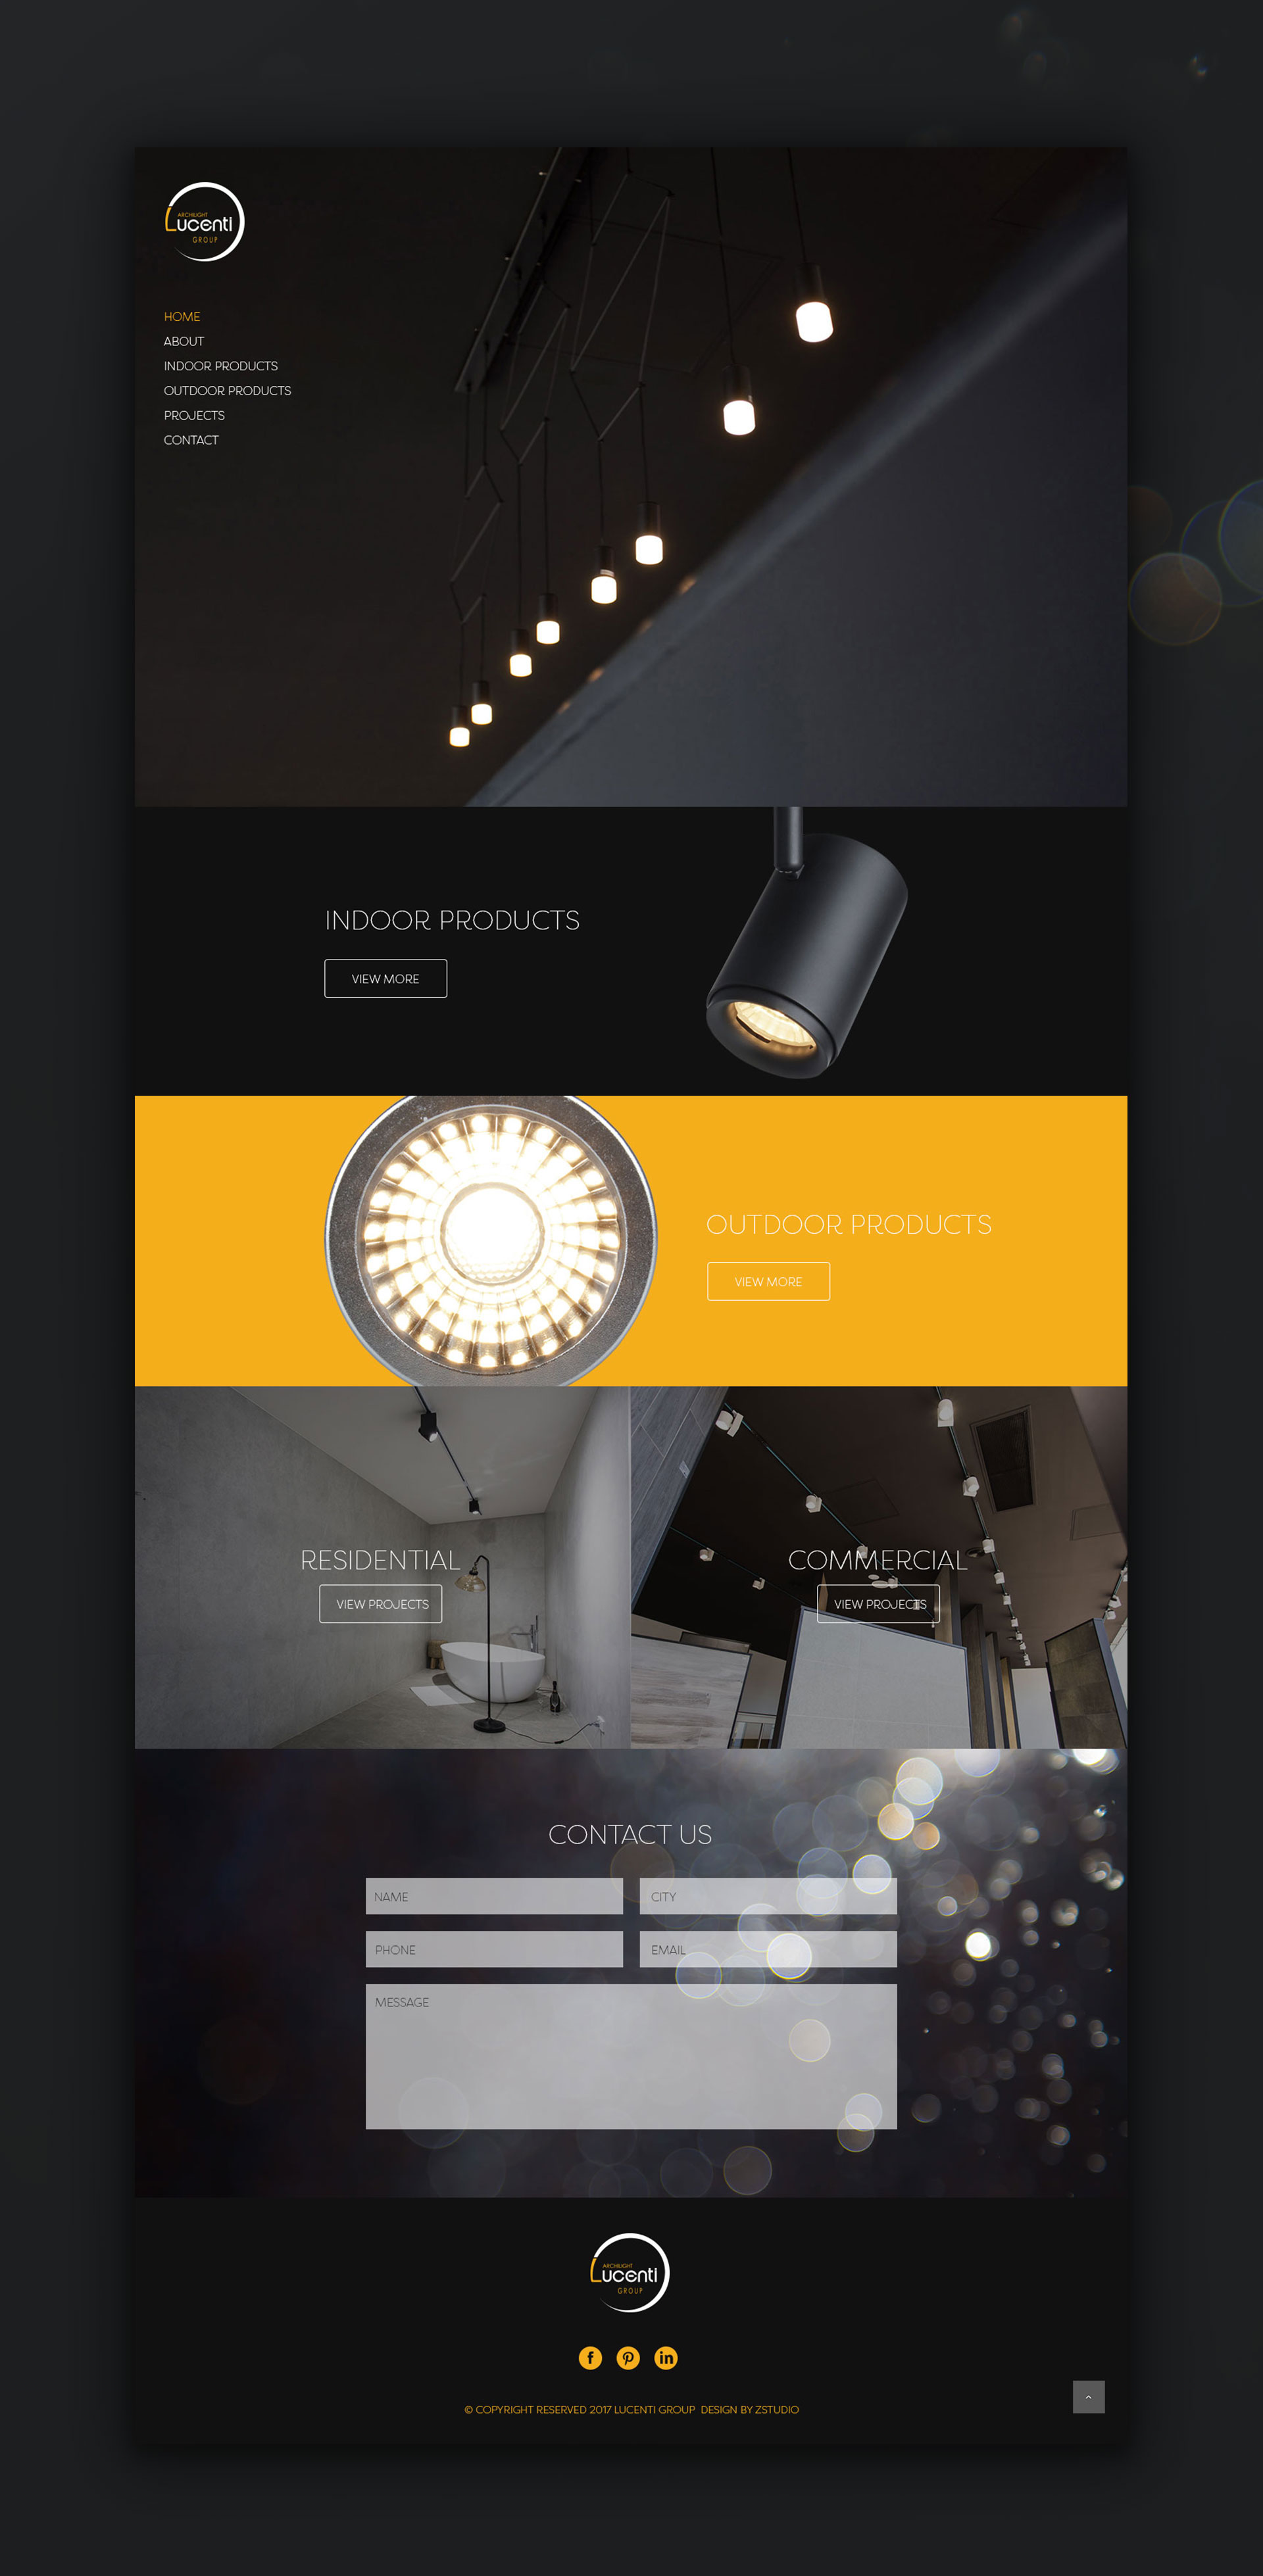 Lucenti Lighting Web-design by Z Creative Studio Branding & Graphic Design Melbourne